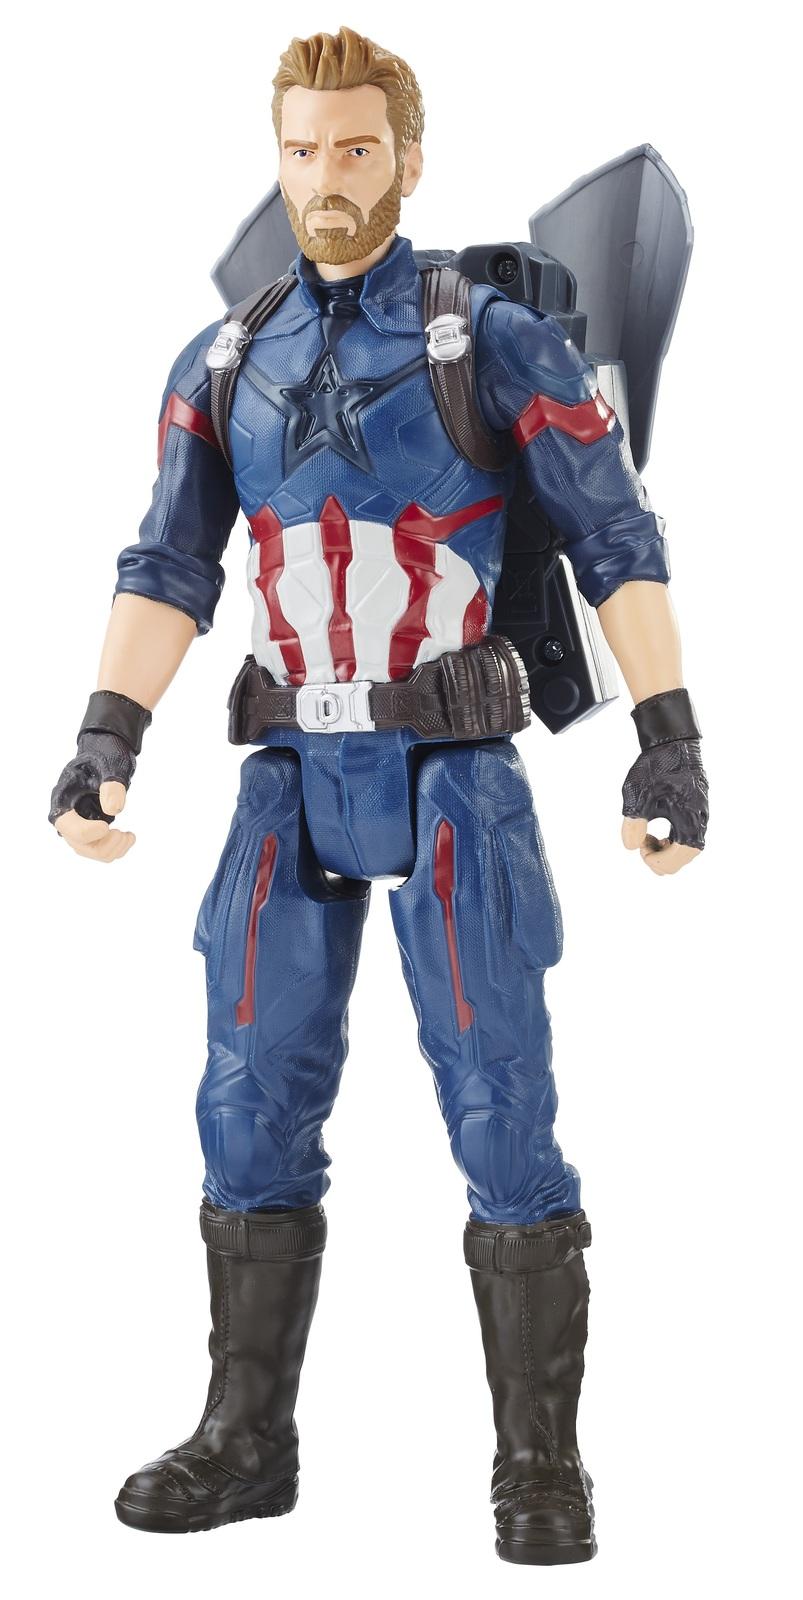 "Avengers Infinity War: Power FX Captain America - 12"" Titan Hero Figure image"